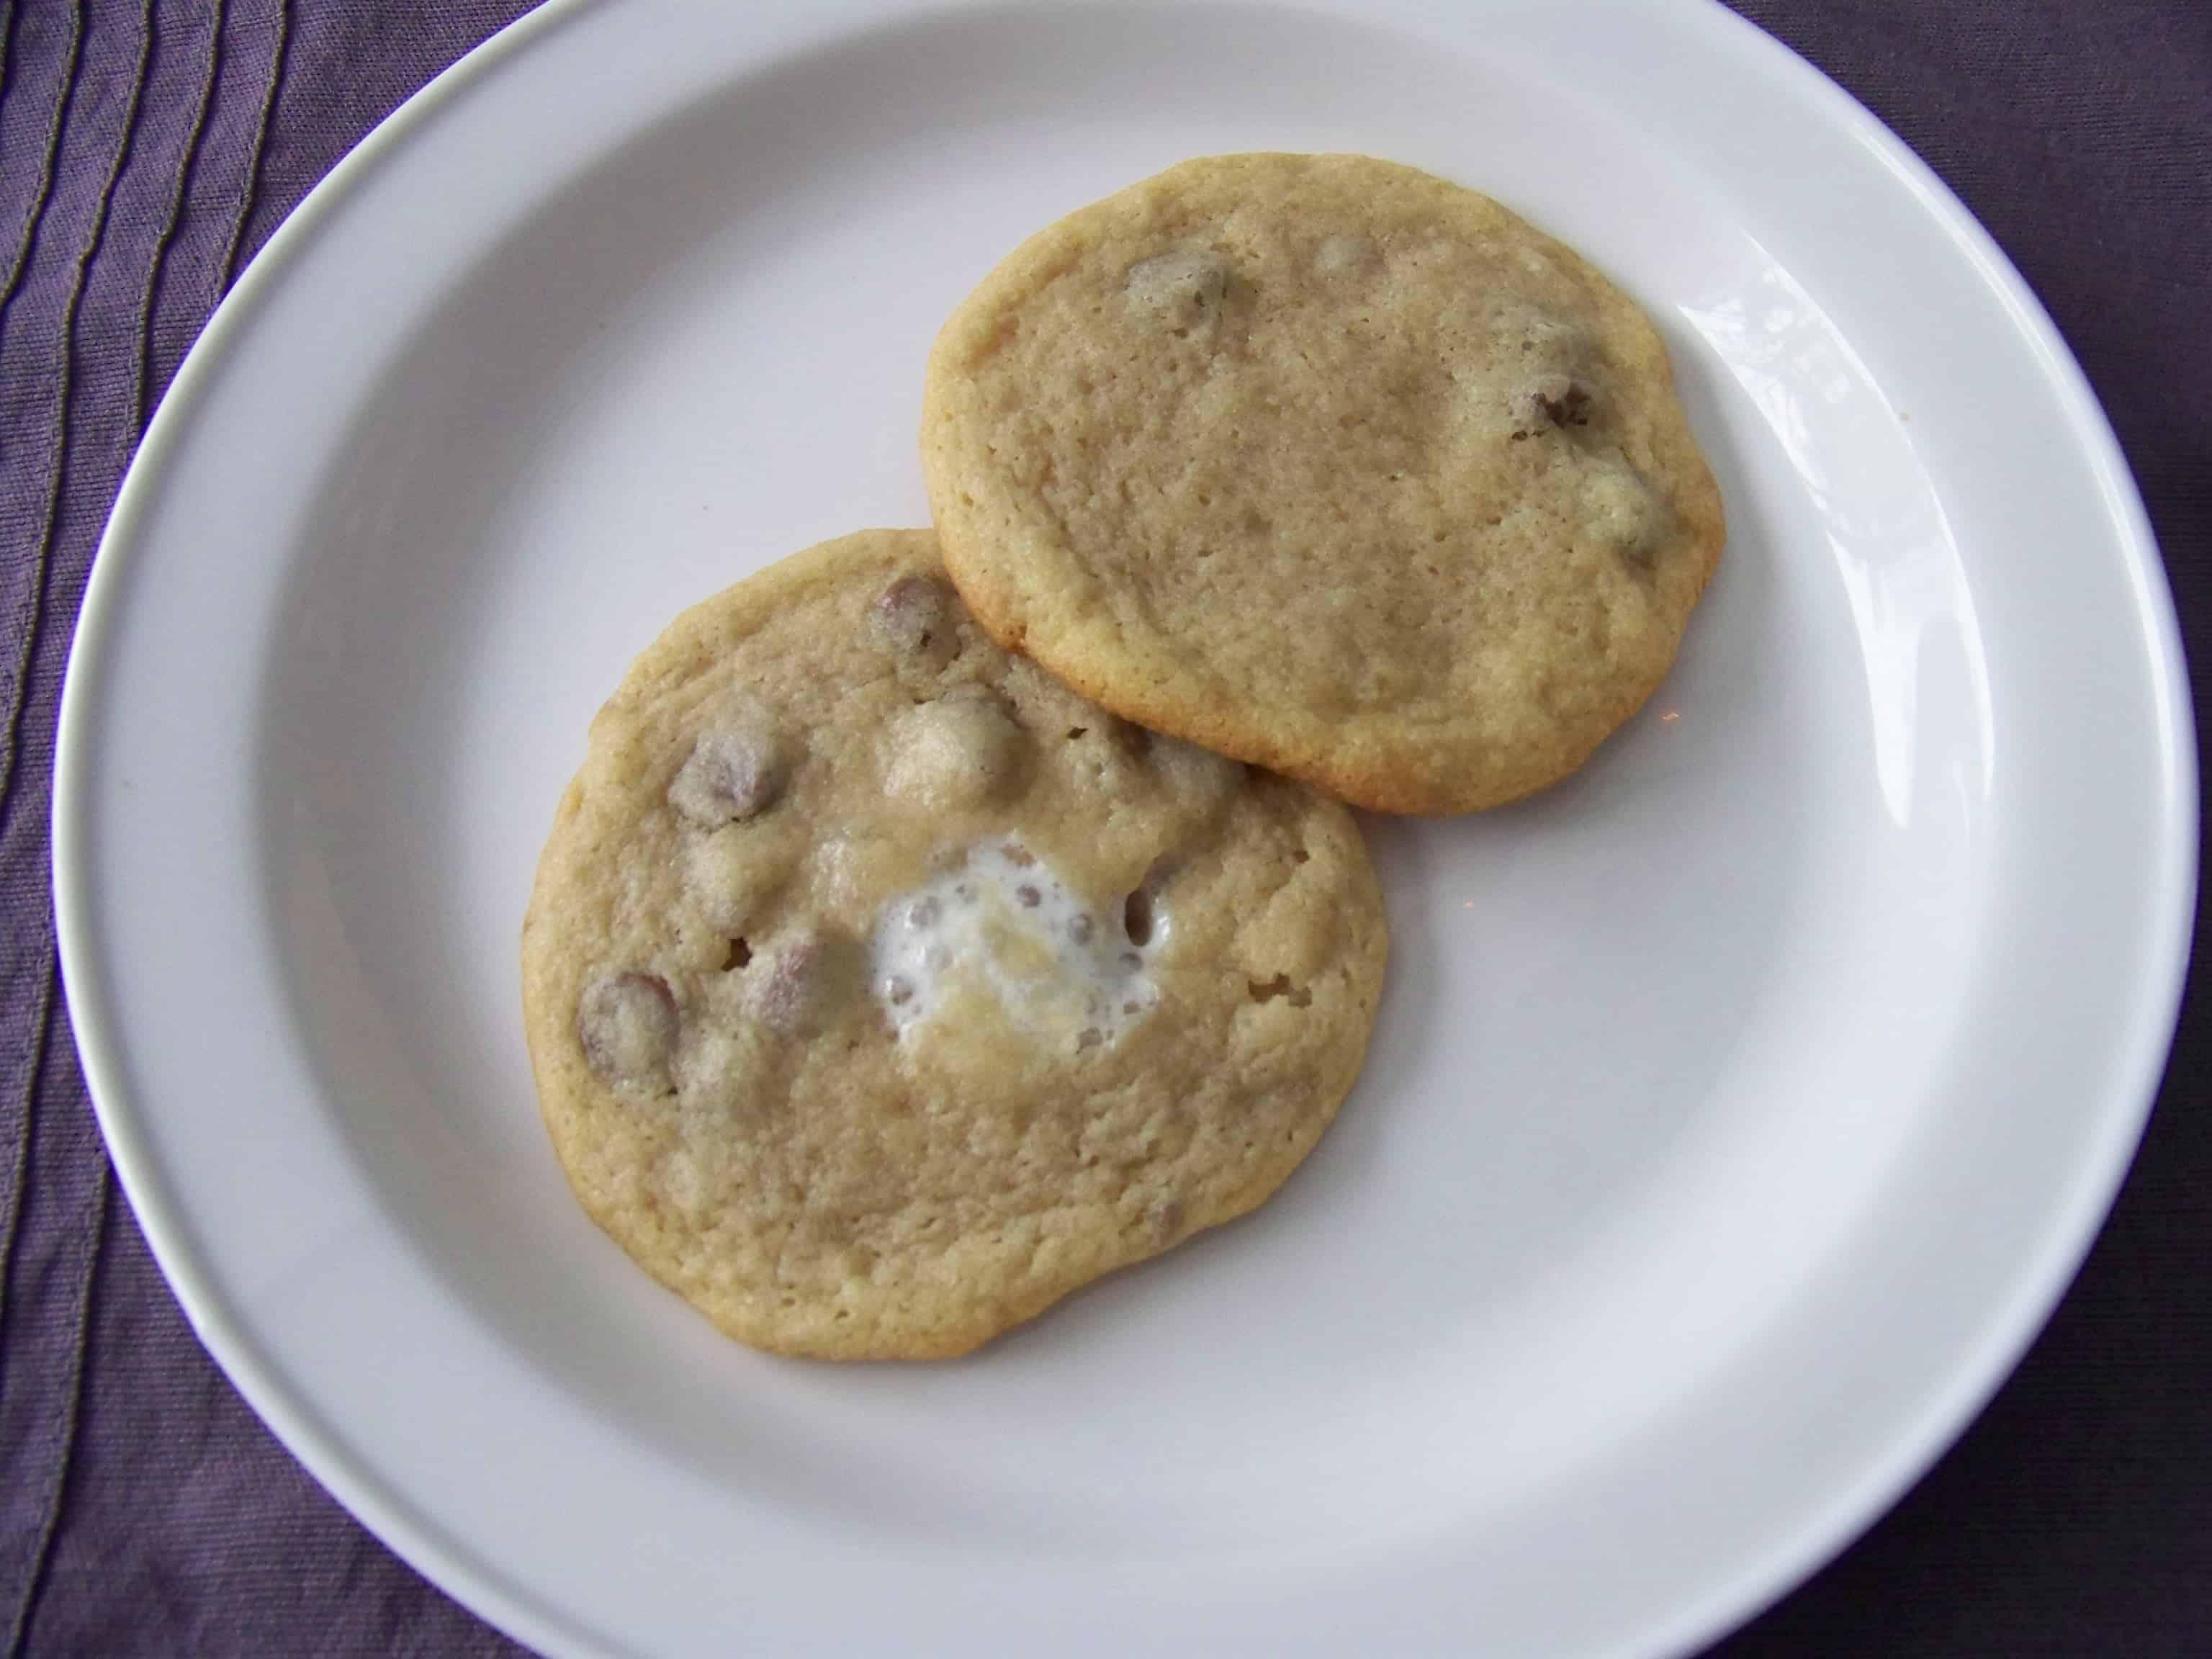 Recipe: Chocolate Chip Marshmallow Cookies